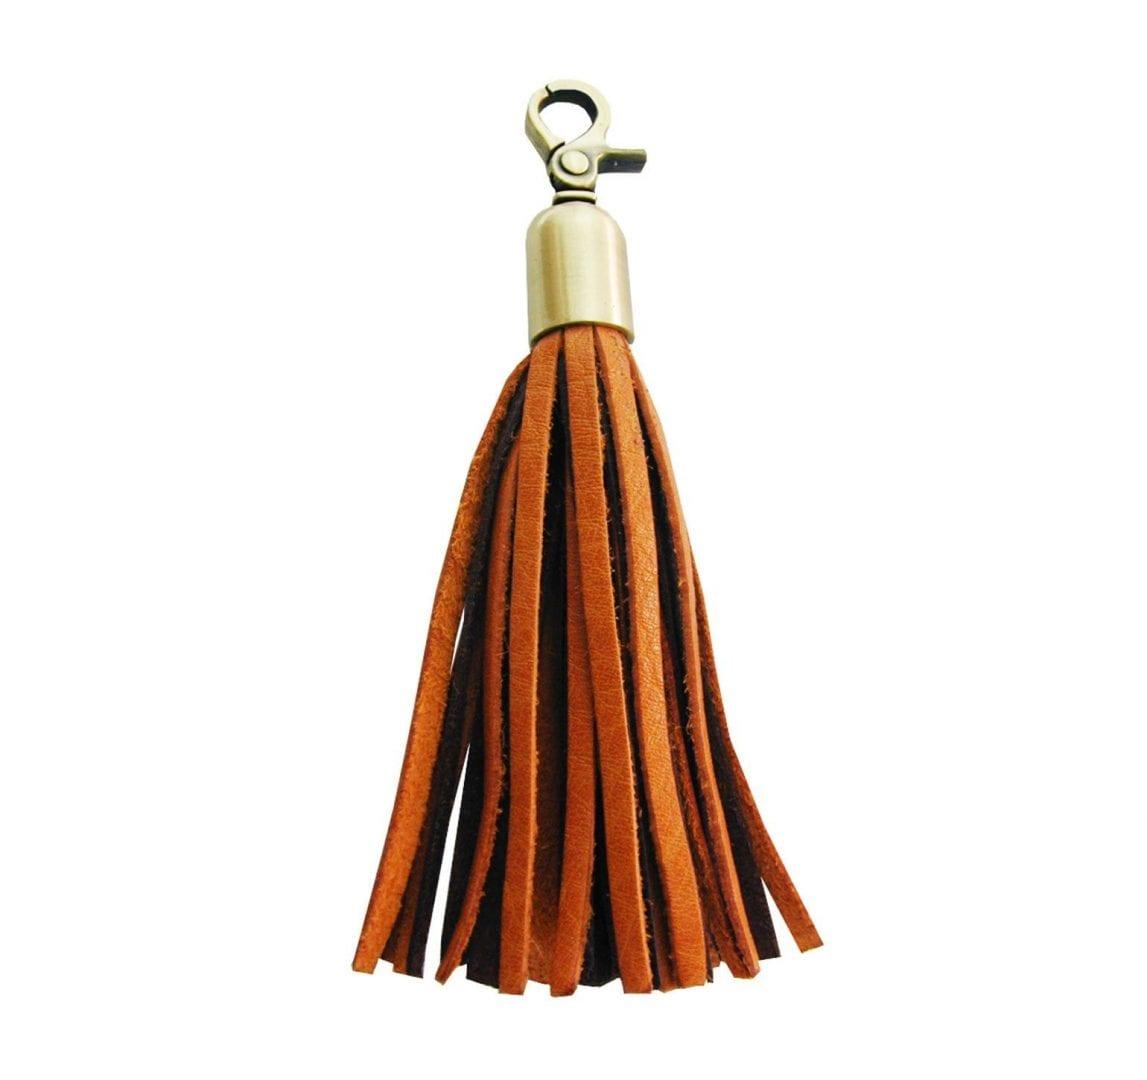 camel brown leather tassel purse charm